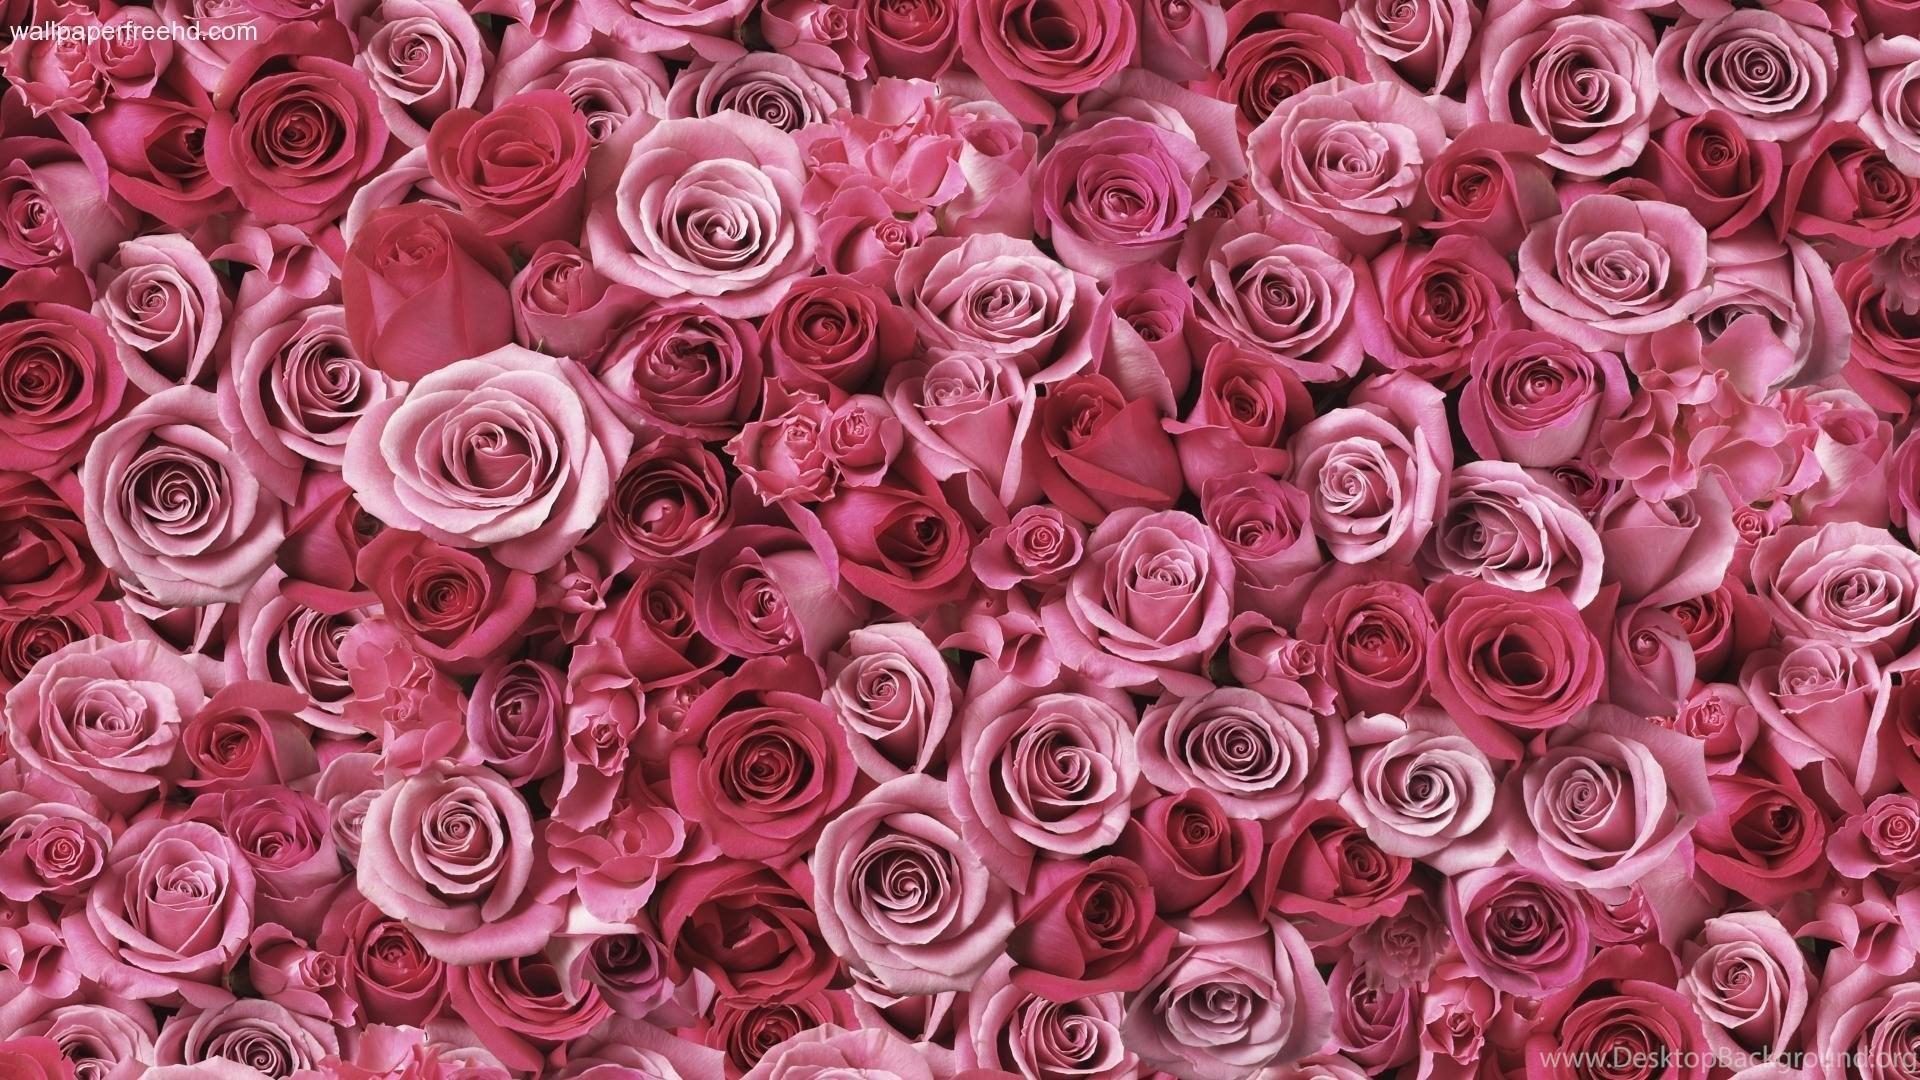 Wallpapers Dark Pink Roses Free Hd Px 1920x1080 Desktop Background